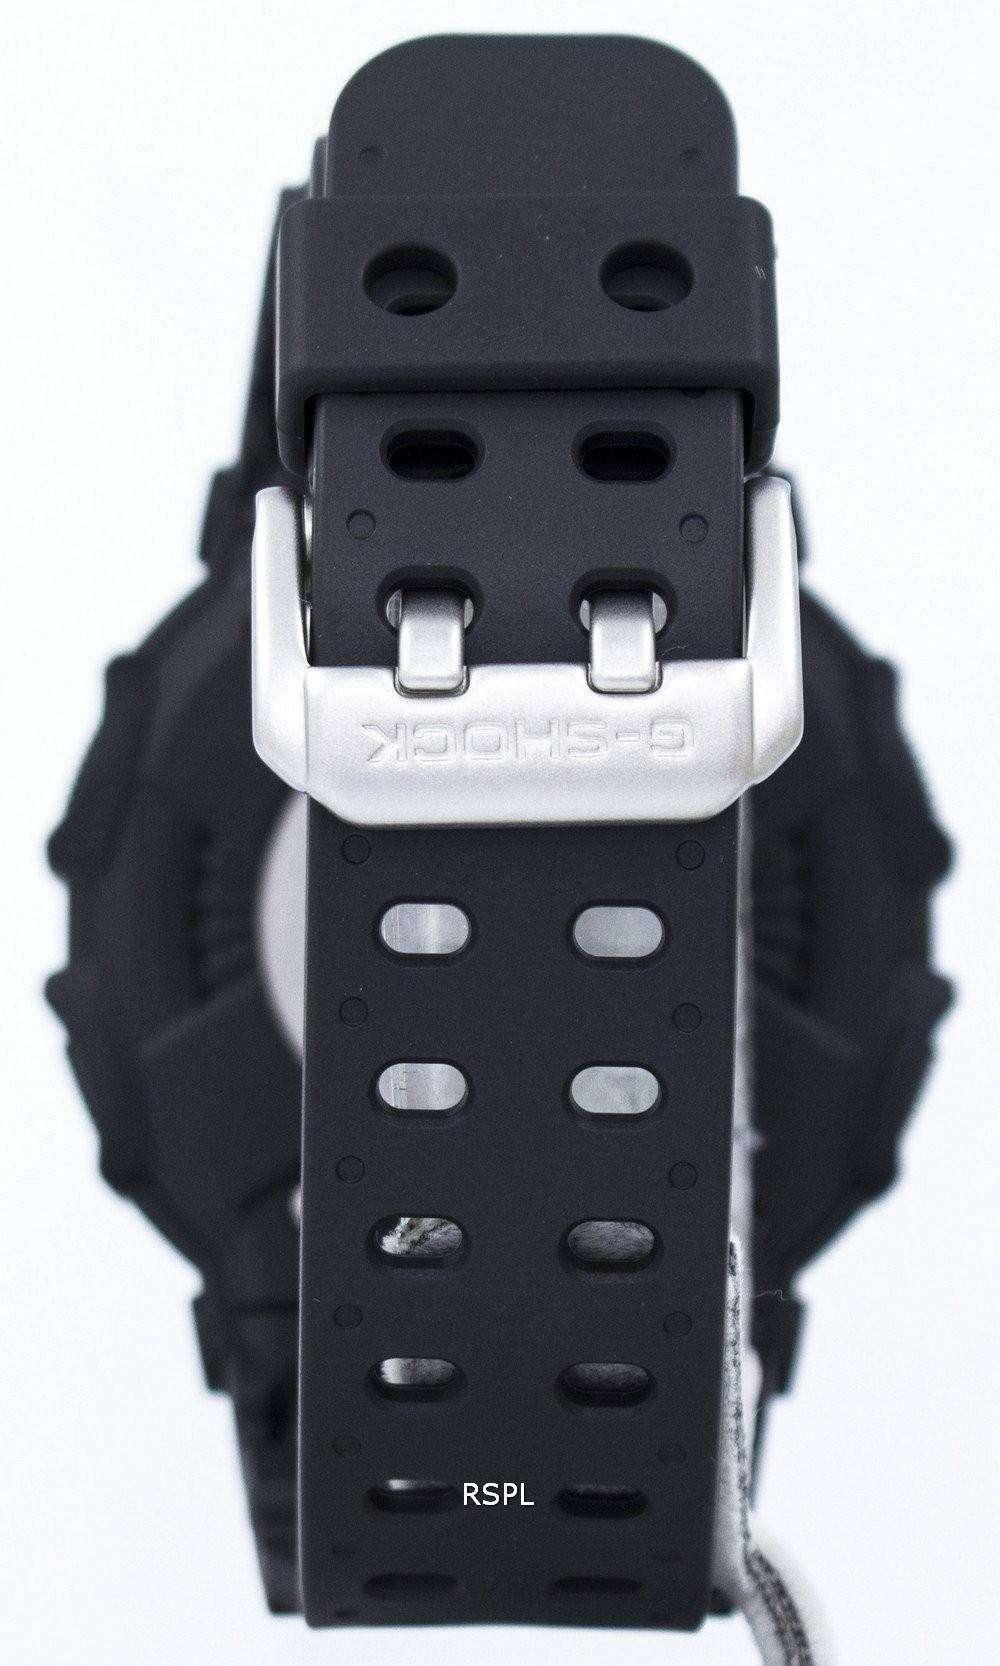 Shock Gx 1 Digital 56bb Tough Hombres De Solar Casio G Los Reloj ywvn0O8mN